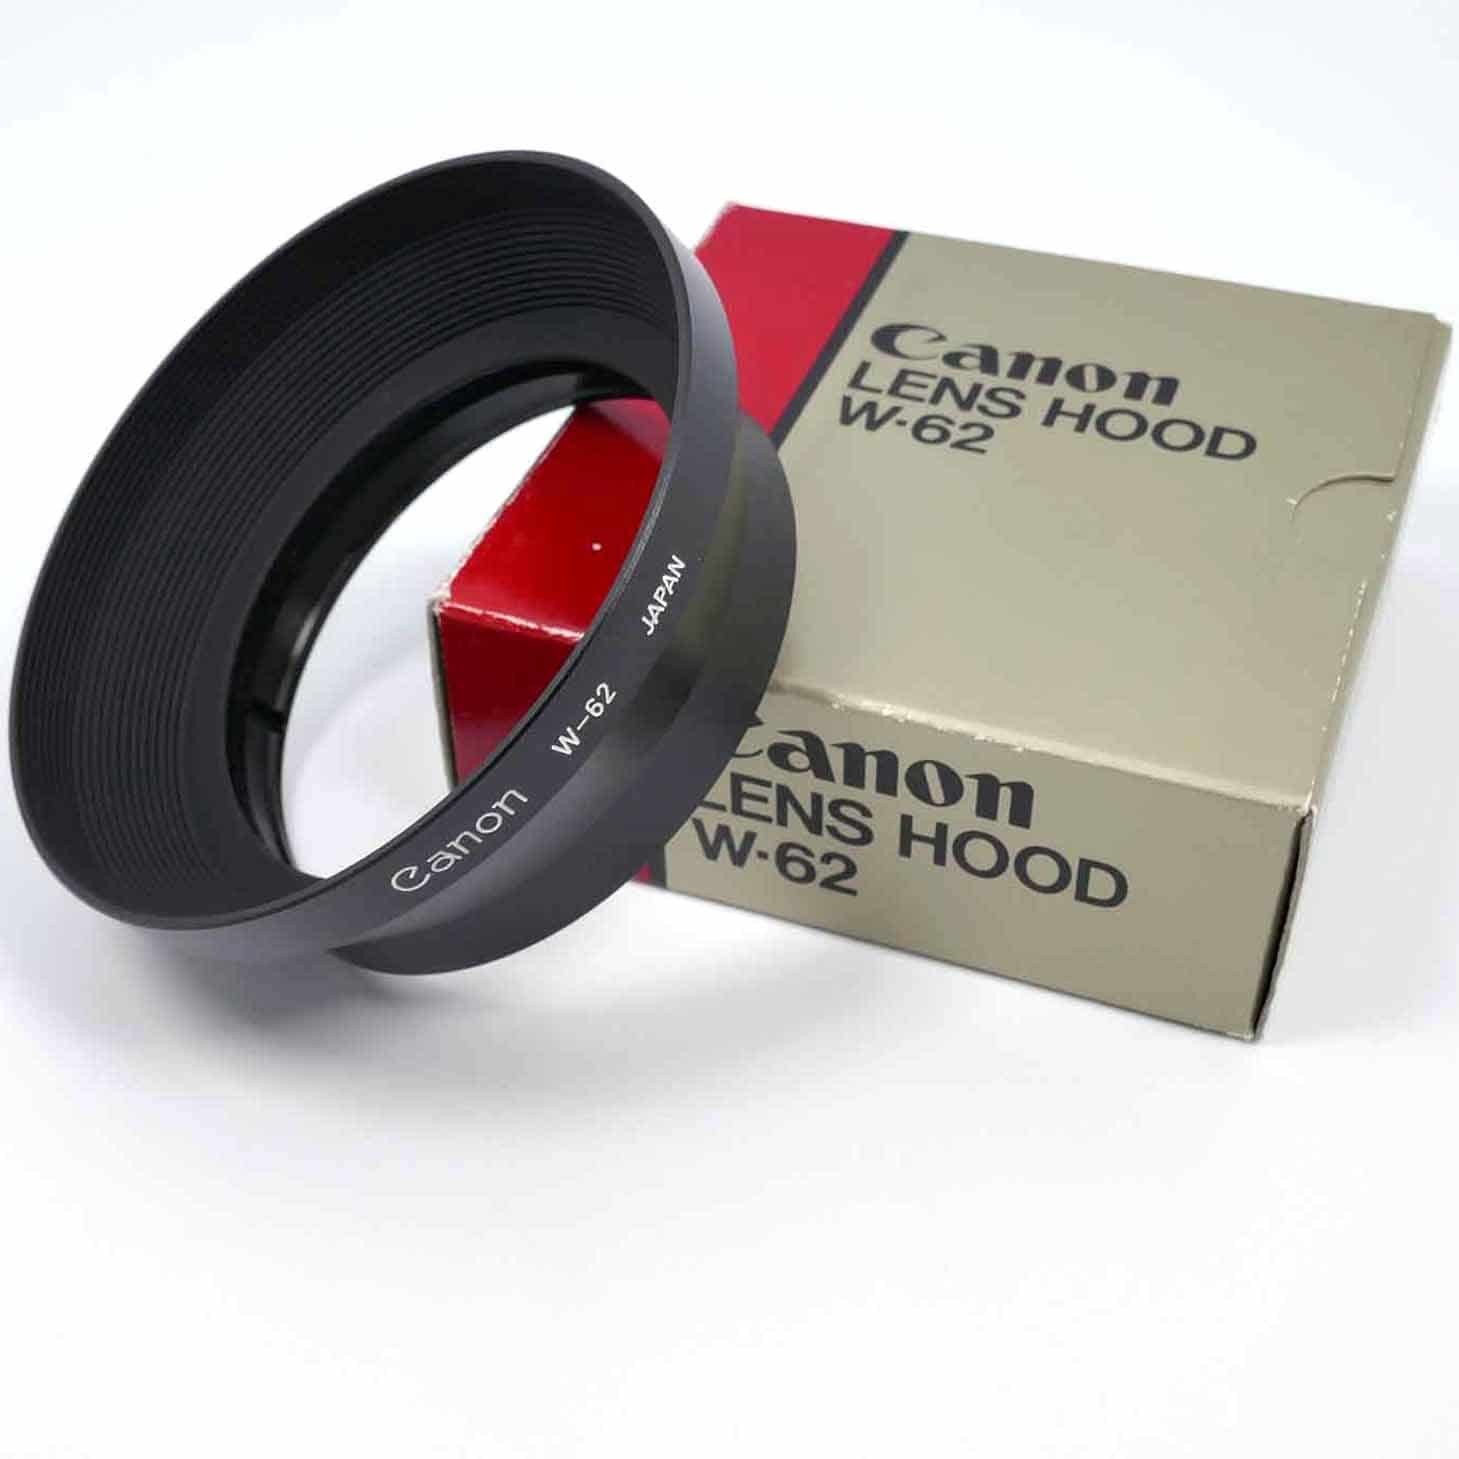 clean-cameras-Canon-Lens-Hood-W-62--01